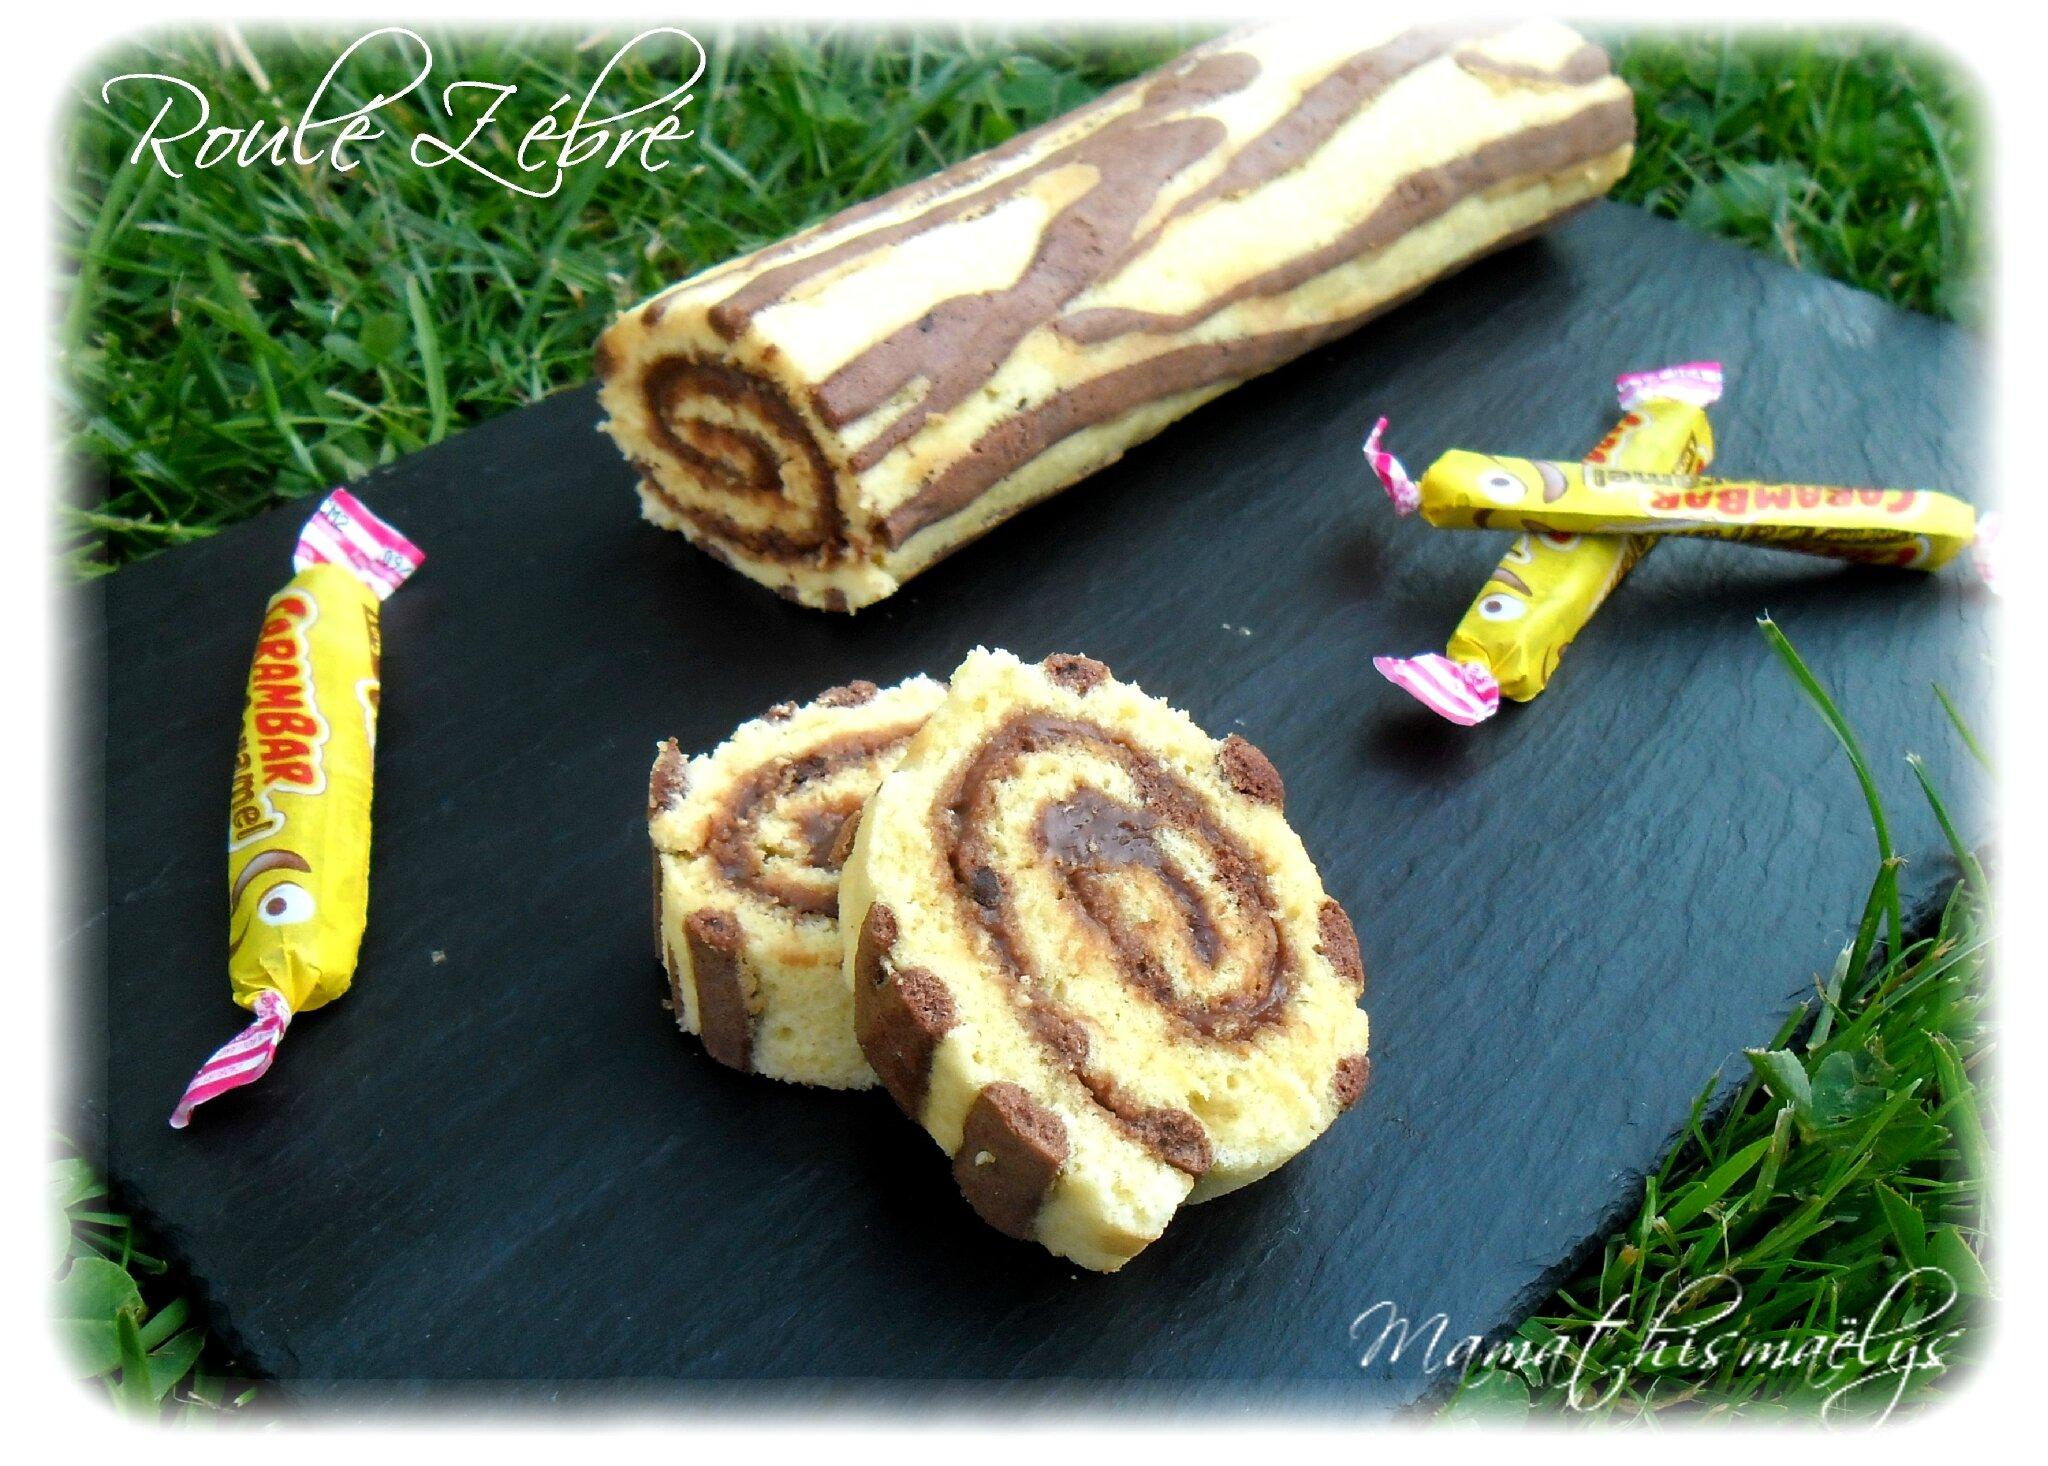 Roulé Zébré à la ganache carambar caramel